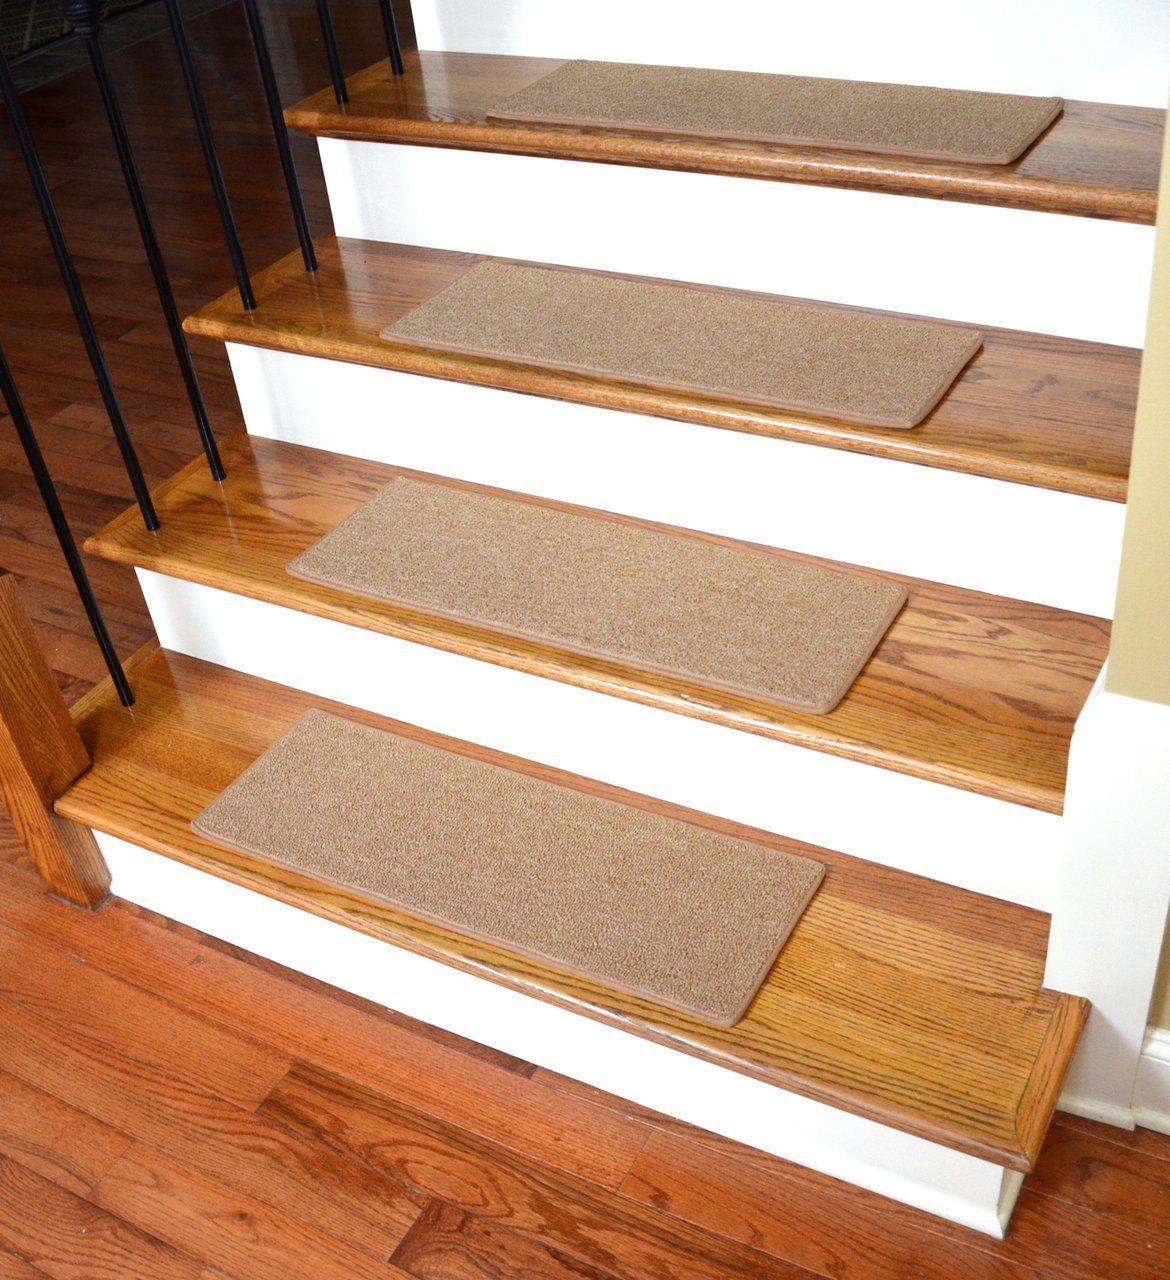 Dean Non Slip Tape Free Pet Friendly Diy Carpet Stair Treads Rugs | Carpet Stair Treads Lowes | Diy | Underlay Carpet | Luxury Vinyl Stair | Residential | Non Slip